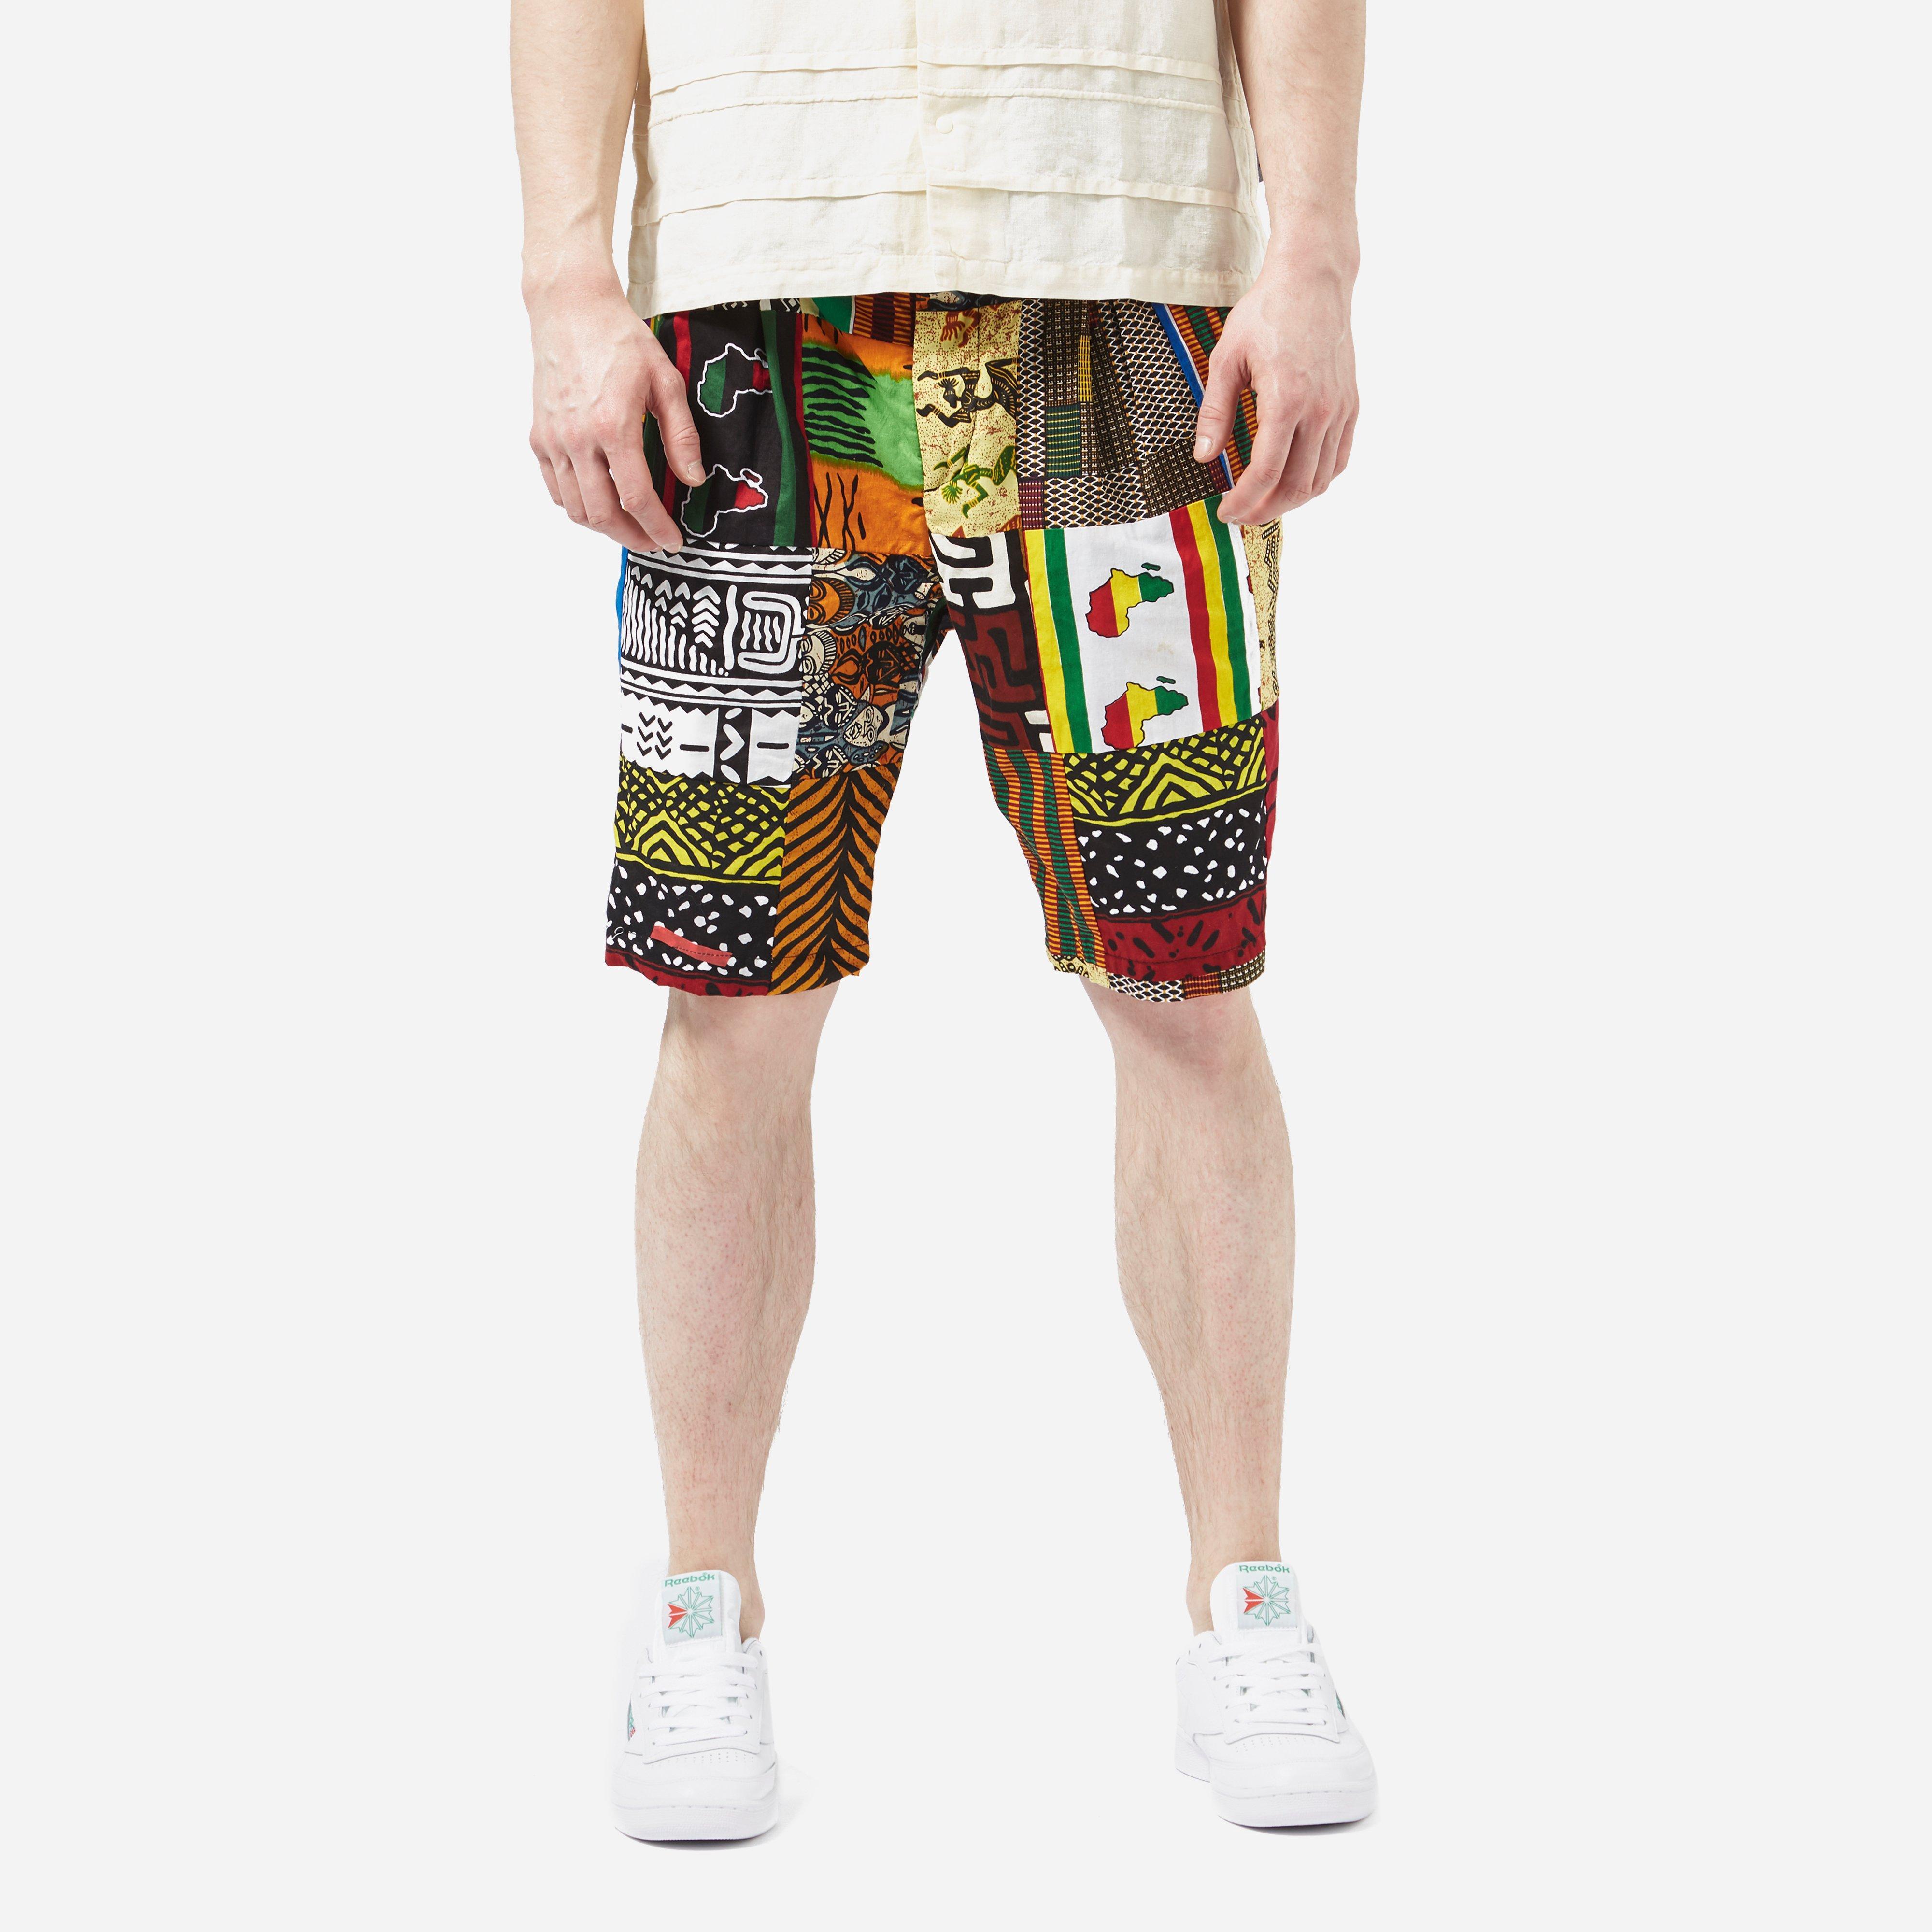 Engineered Garments WP Short